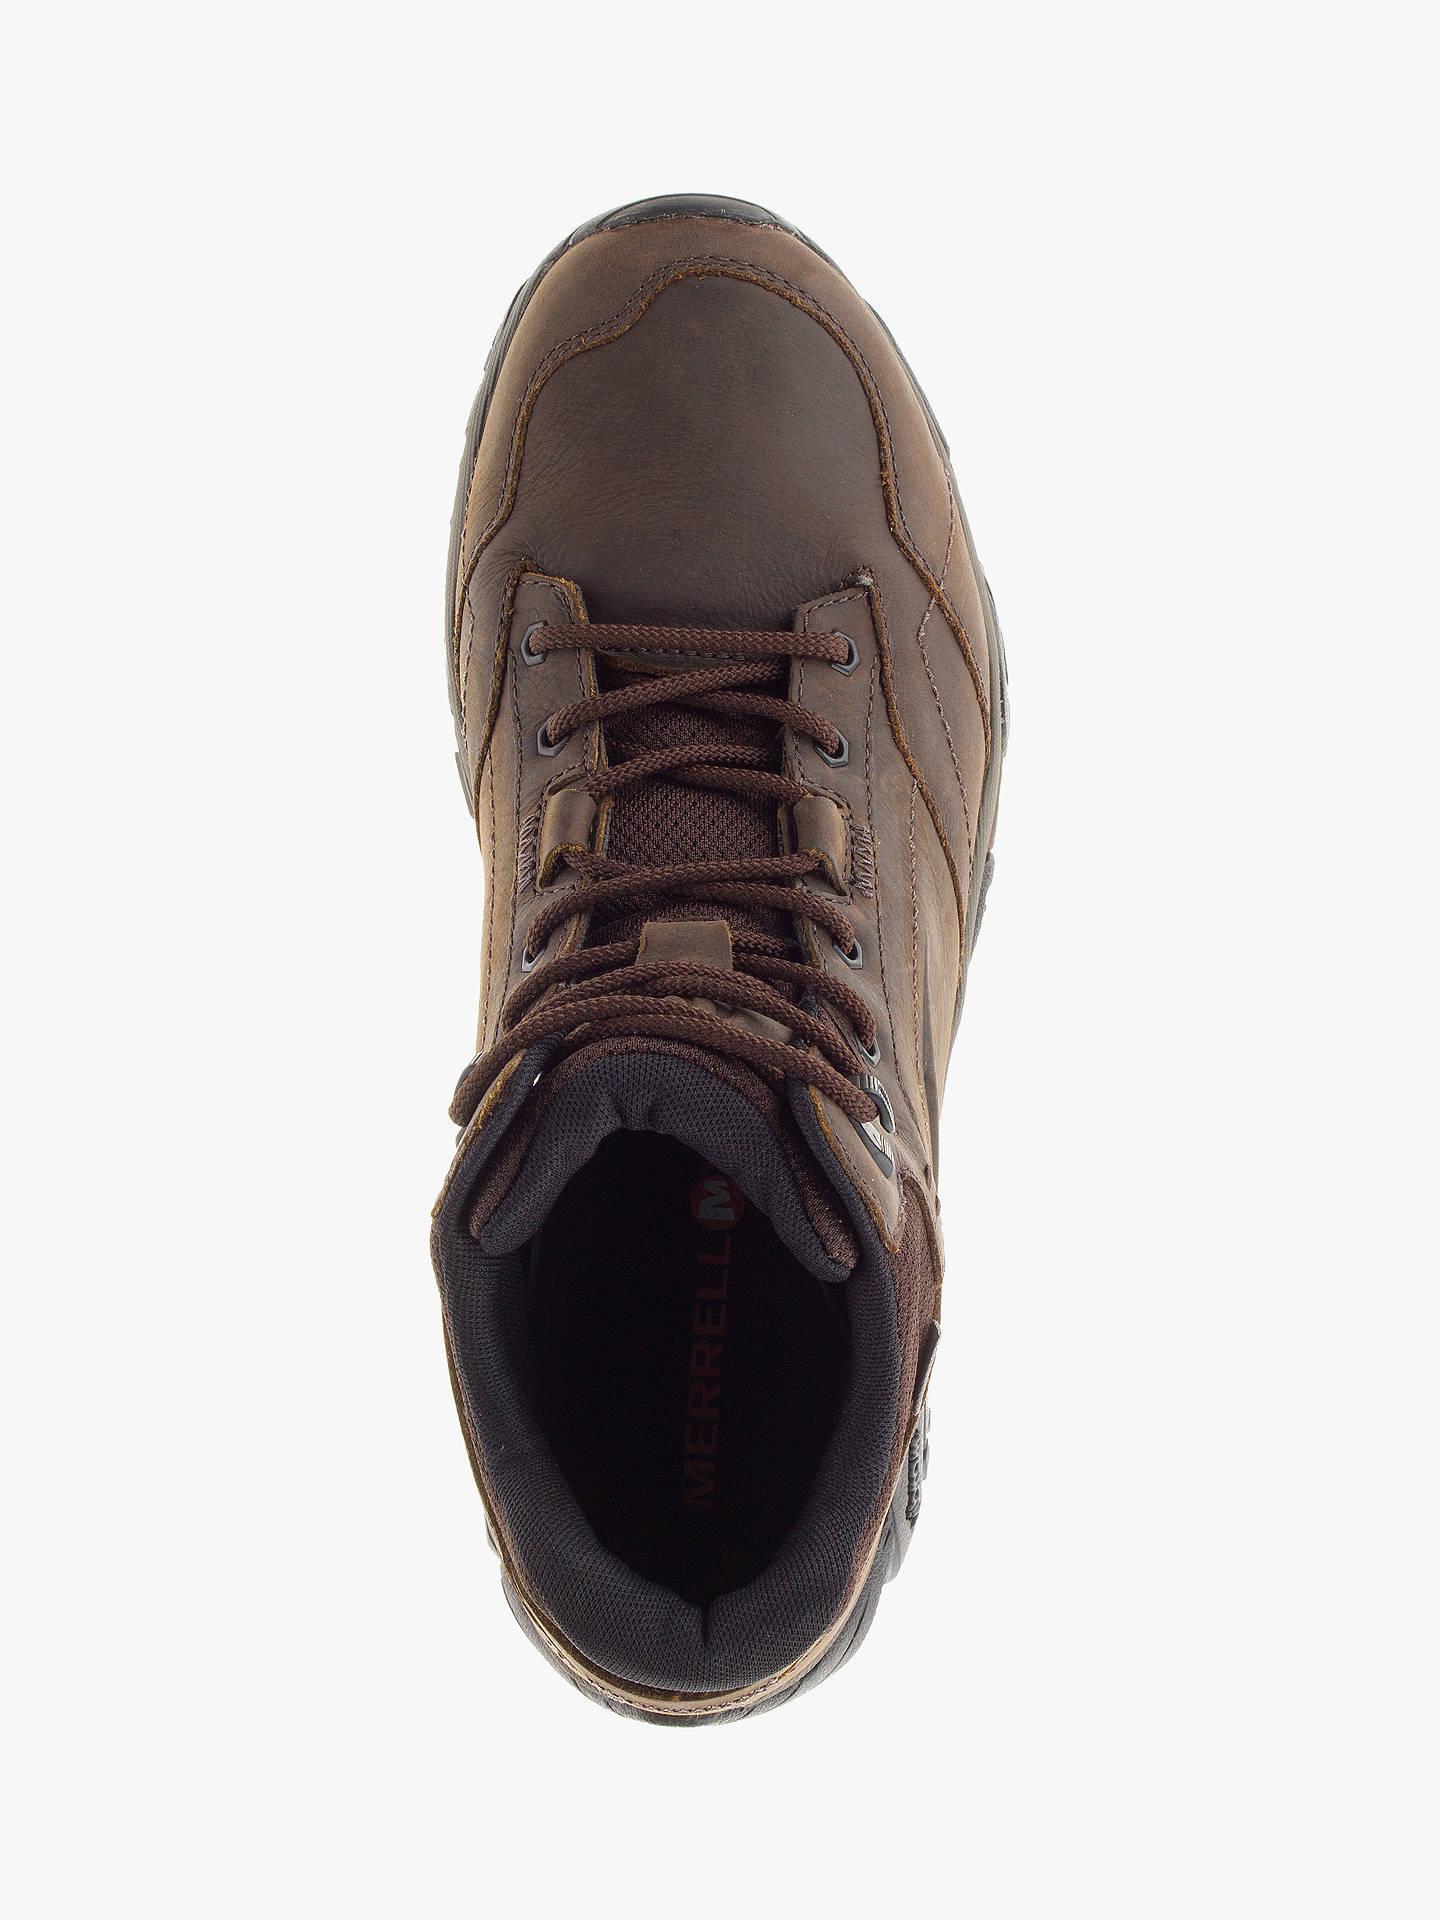 e42ce0079bf Merrell MOAB Adventure Mid Waterproof Men's Hiking Boots, Dark Earth